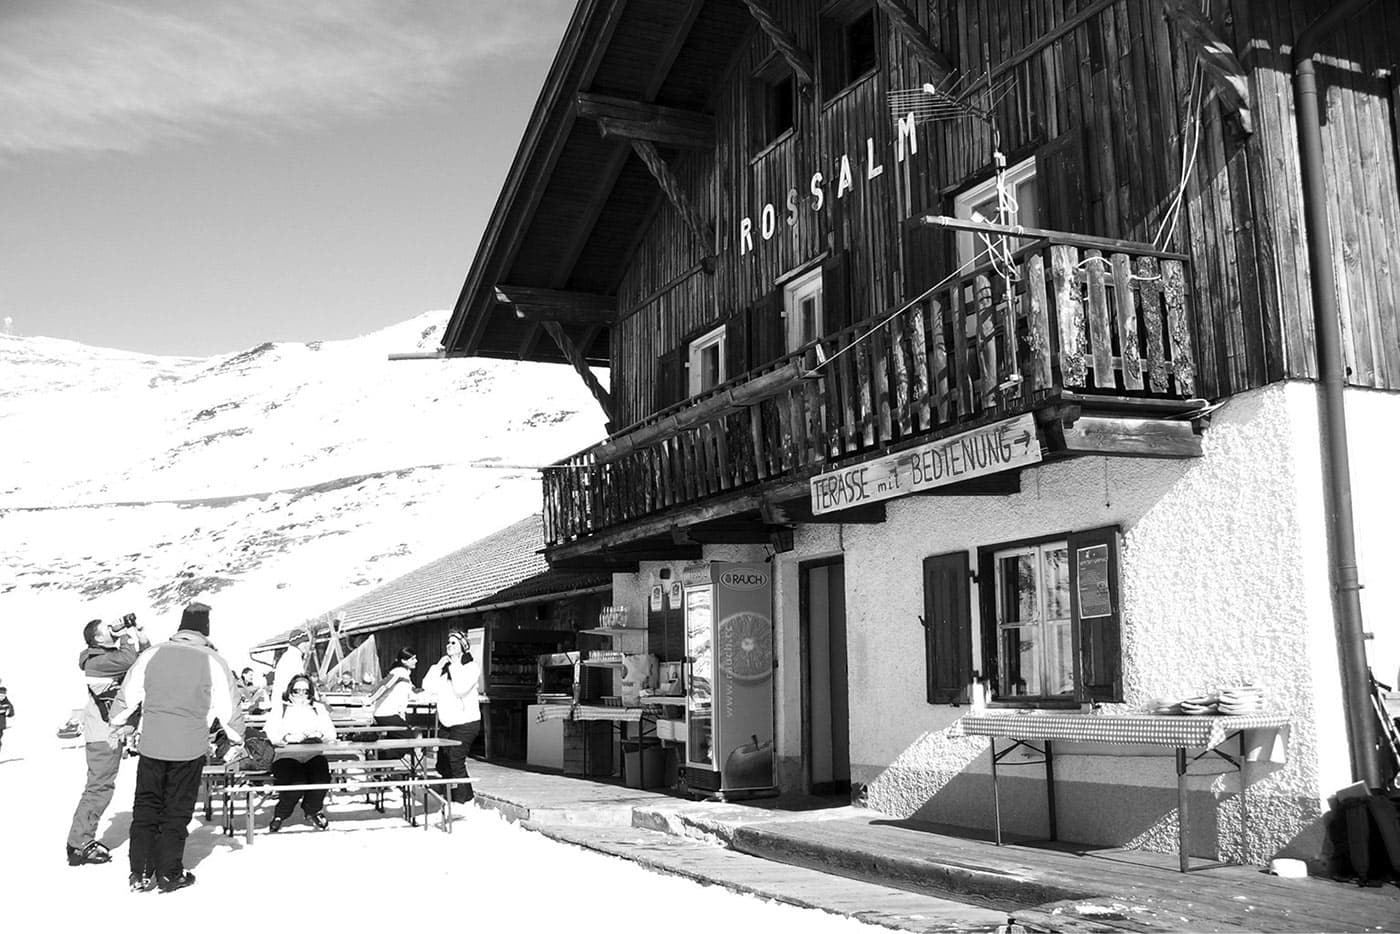 Rossalm in Südtirol | Dolomiten | Plose